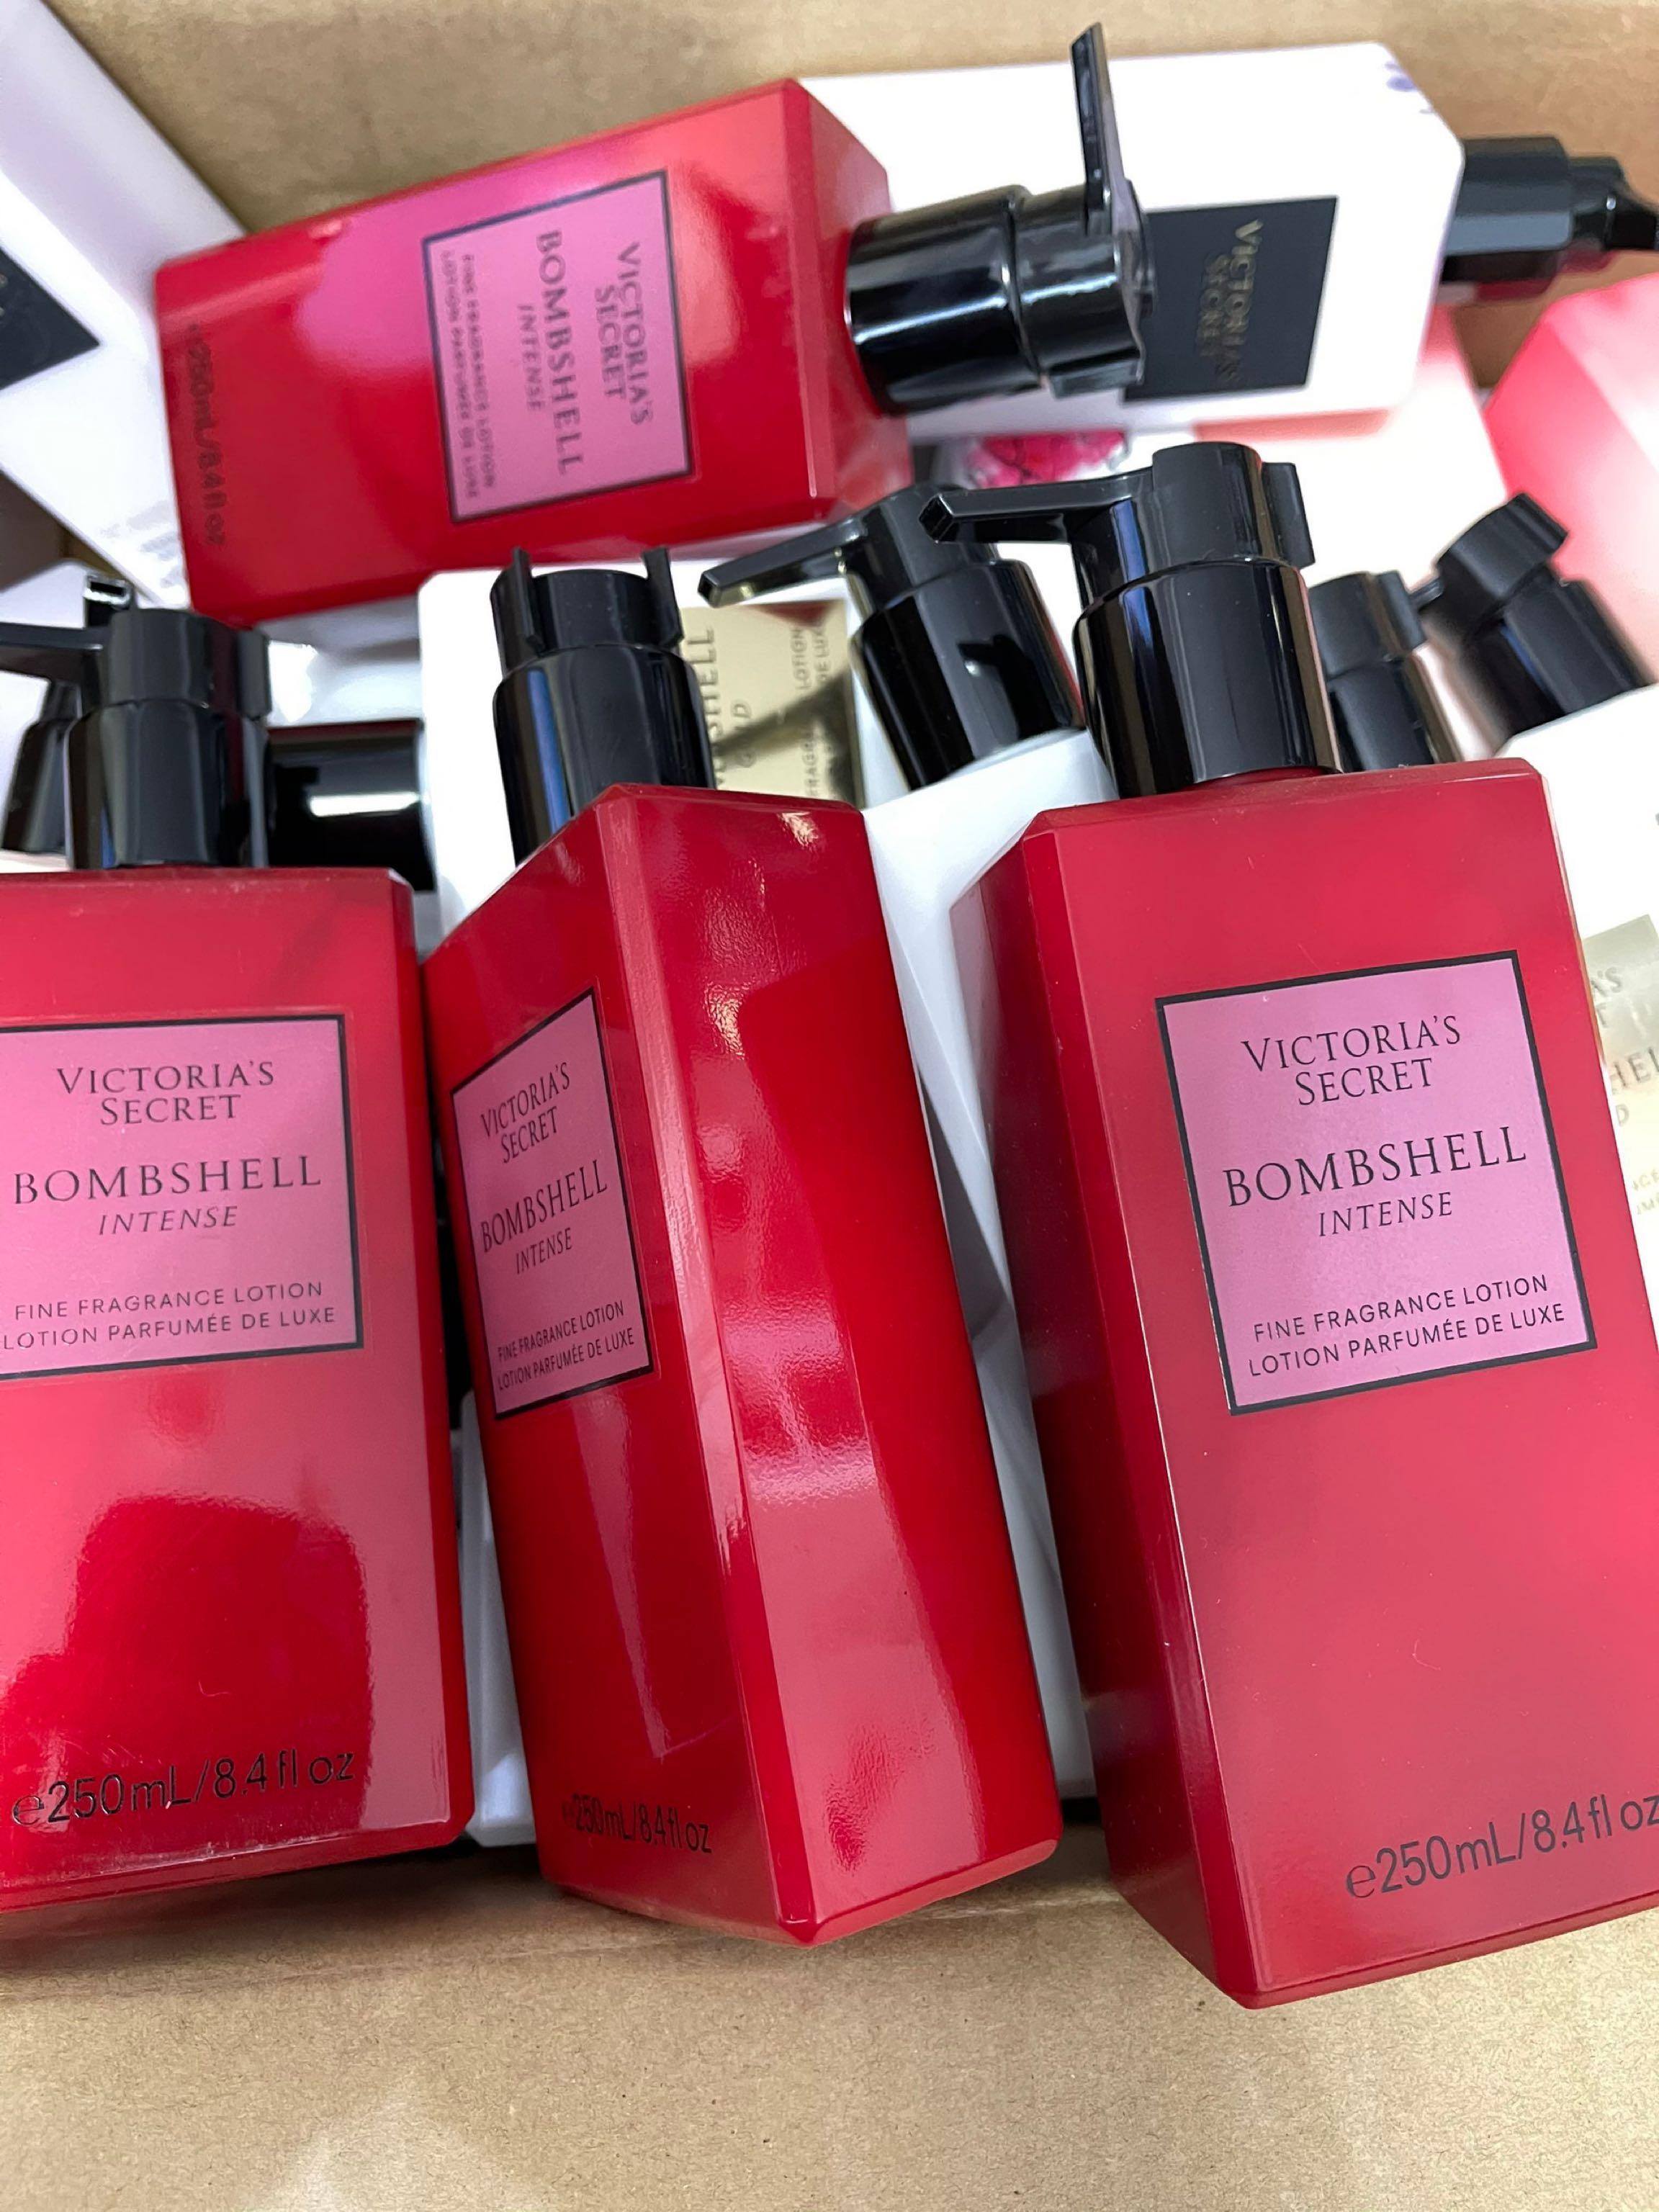 Lotion nước hoa Victoria's Secret #Fragrance Lotion